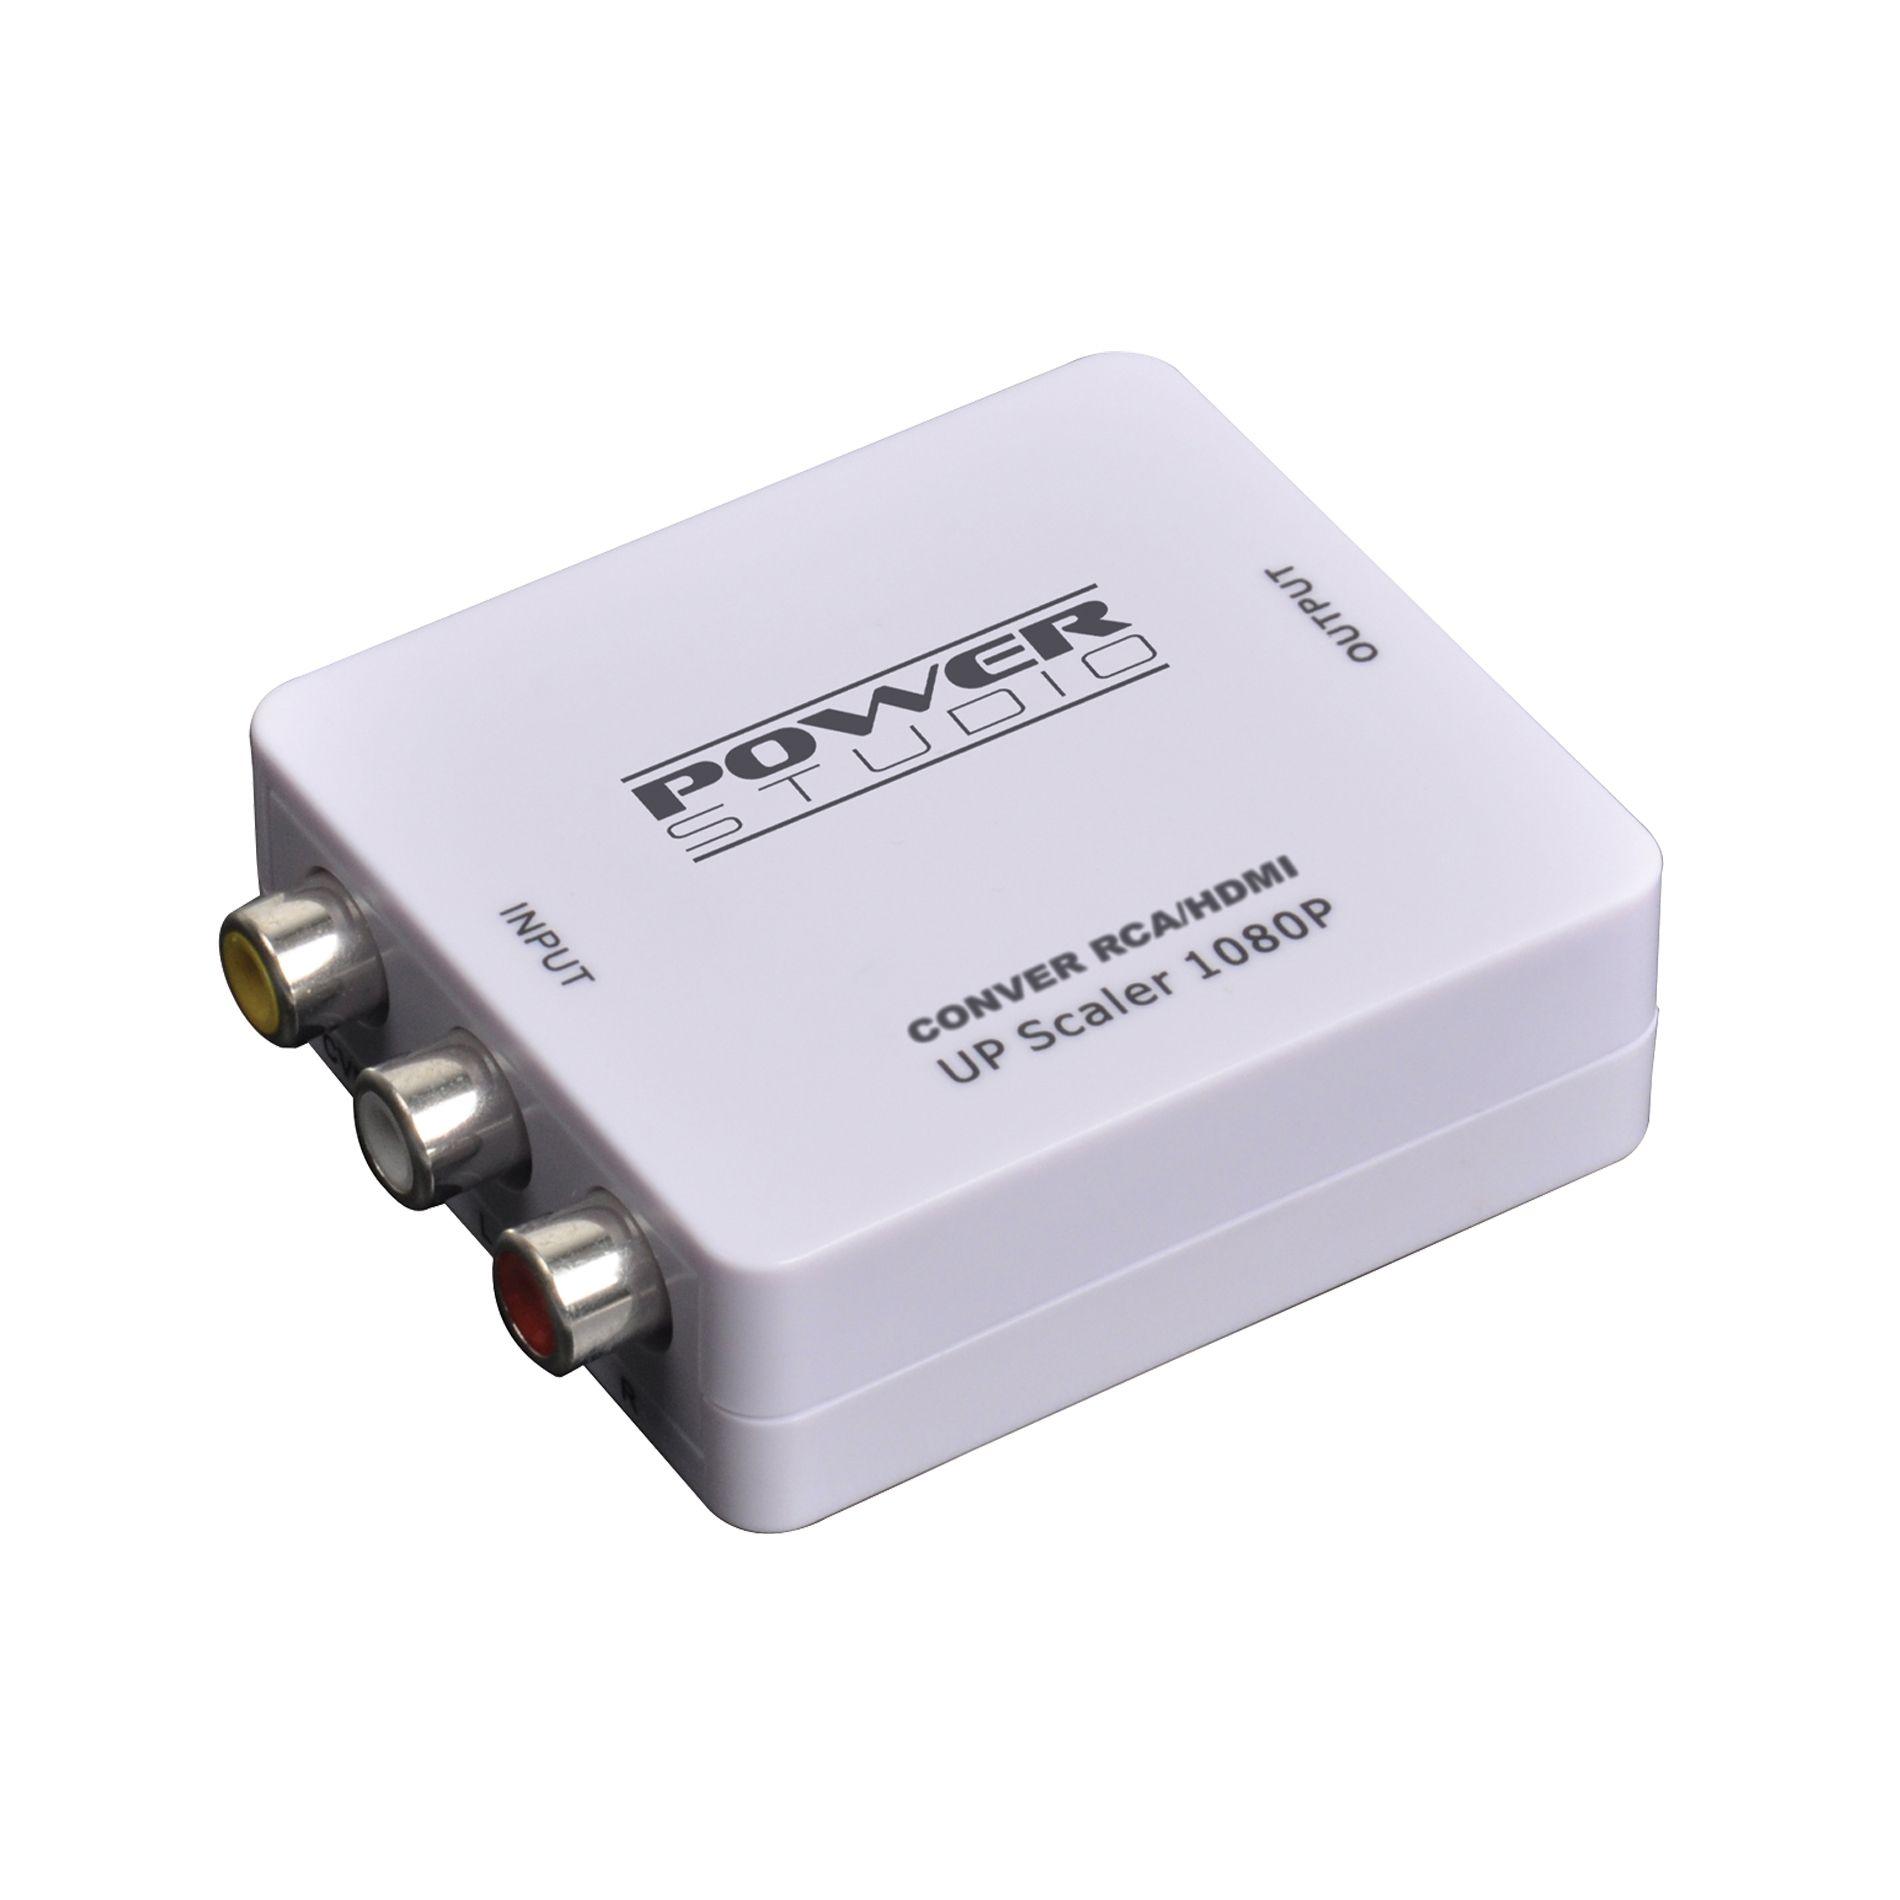 Convertisseur Vidéo Power studio RCA composite vers HDMI upscaler 1080p